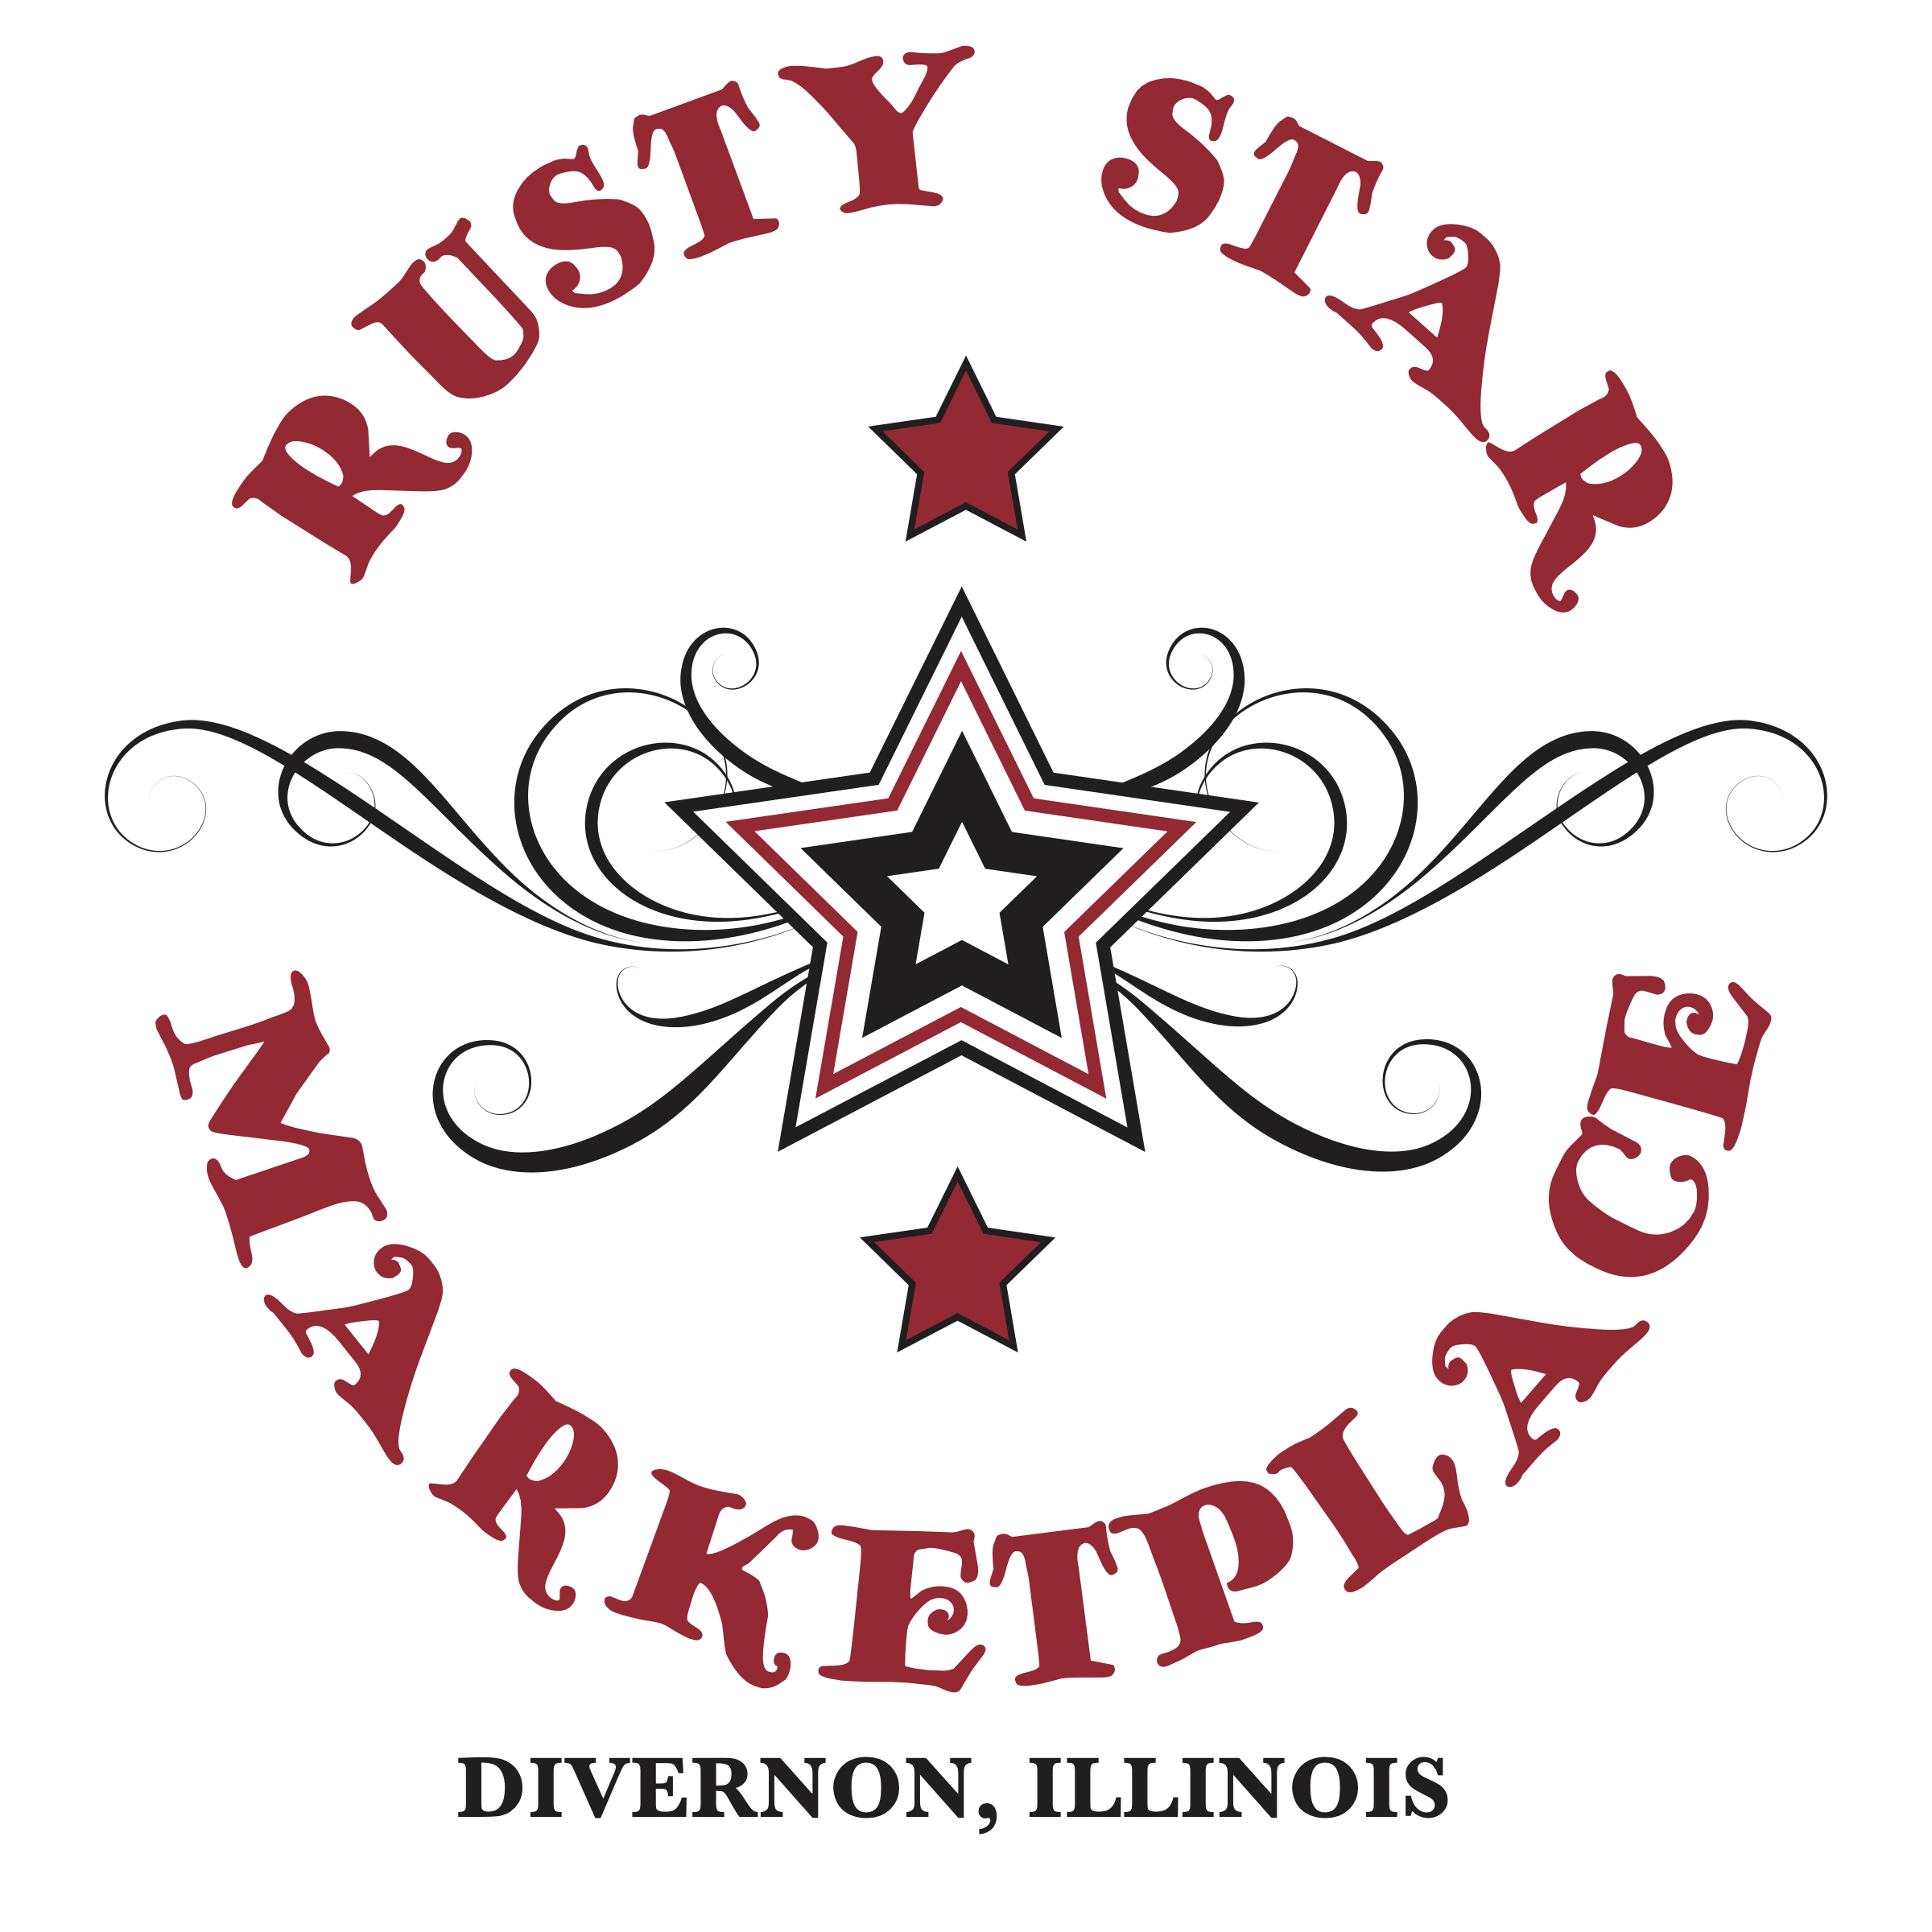 Rust Star logo 2.jpg